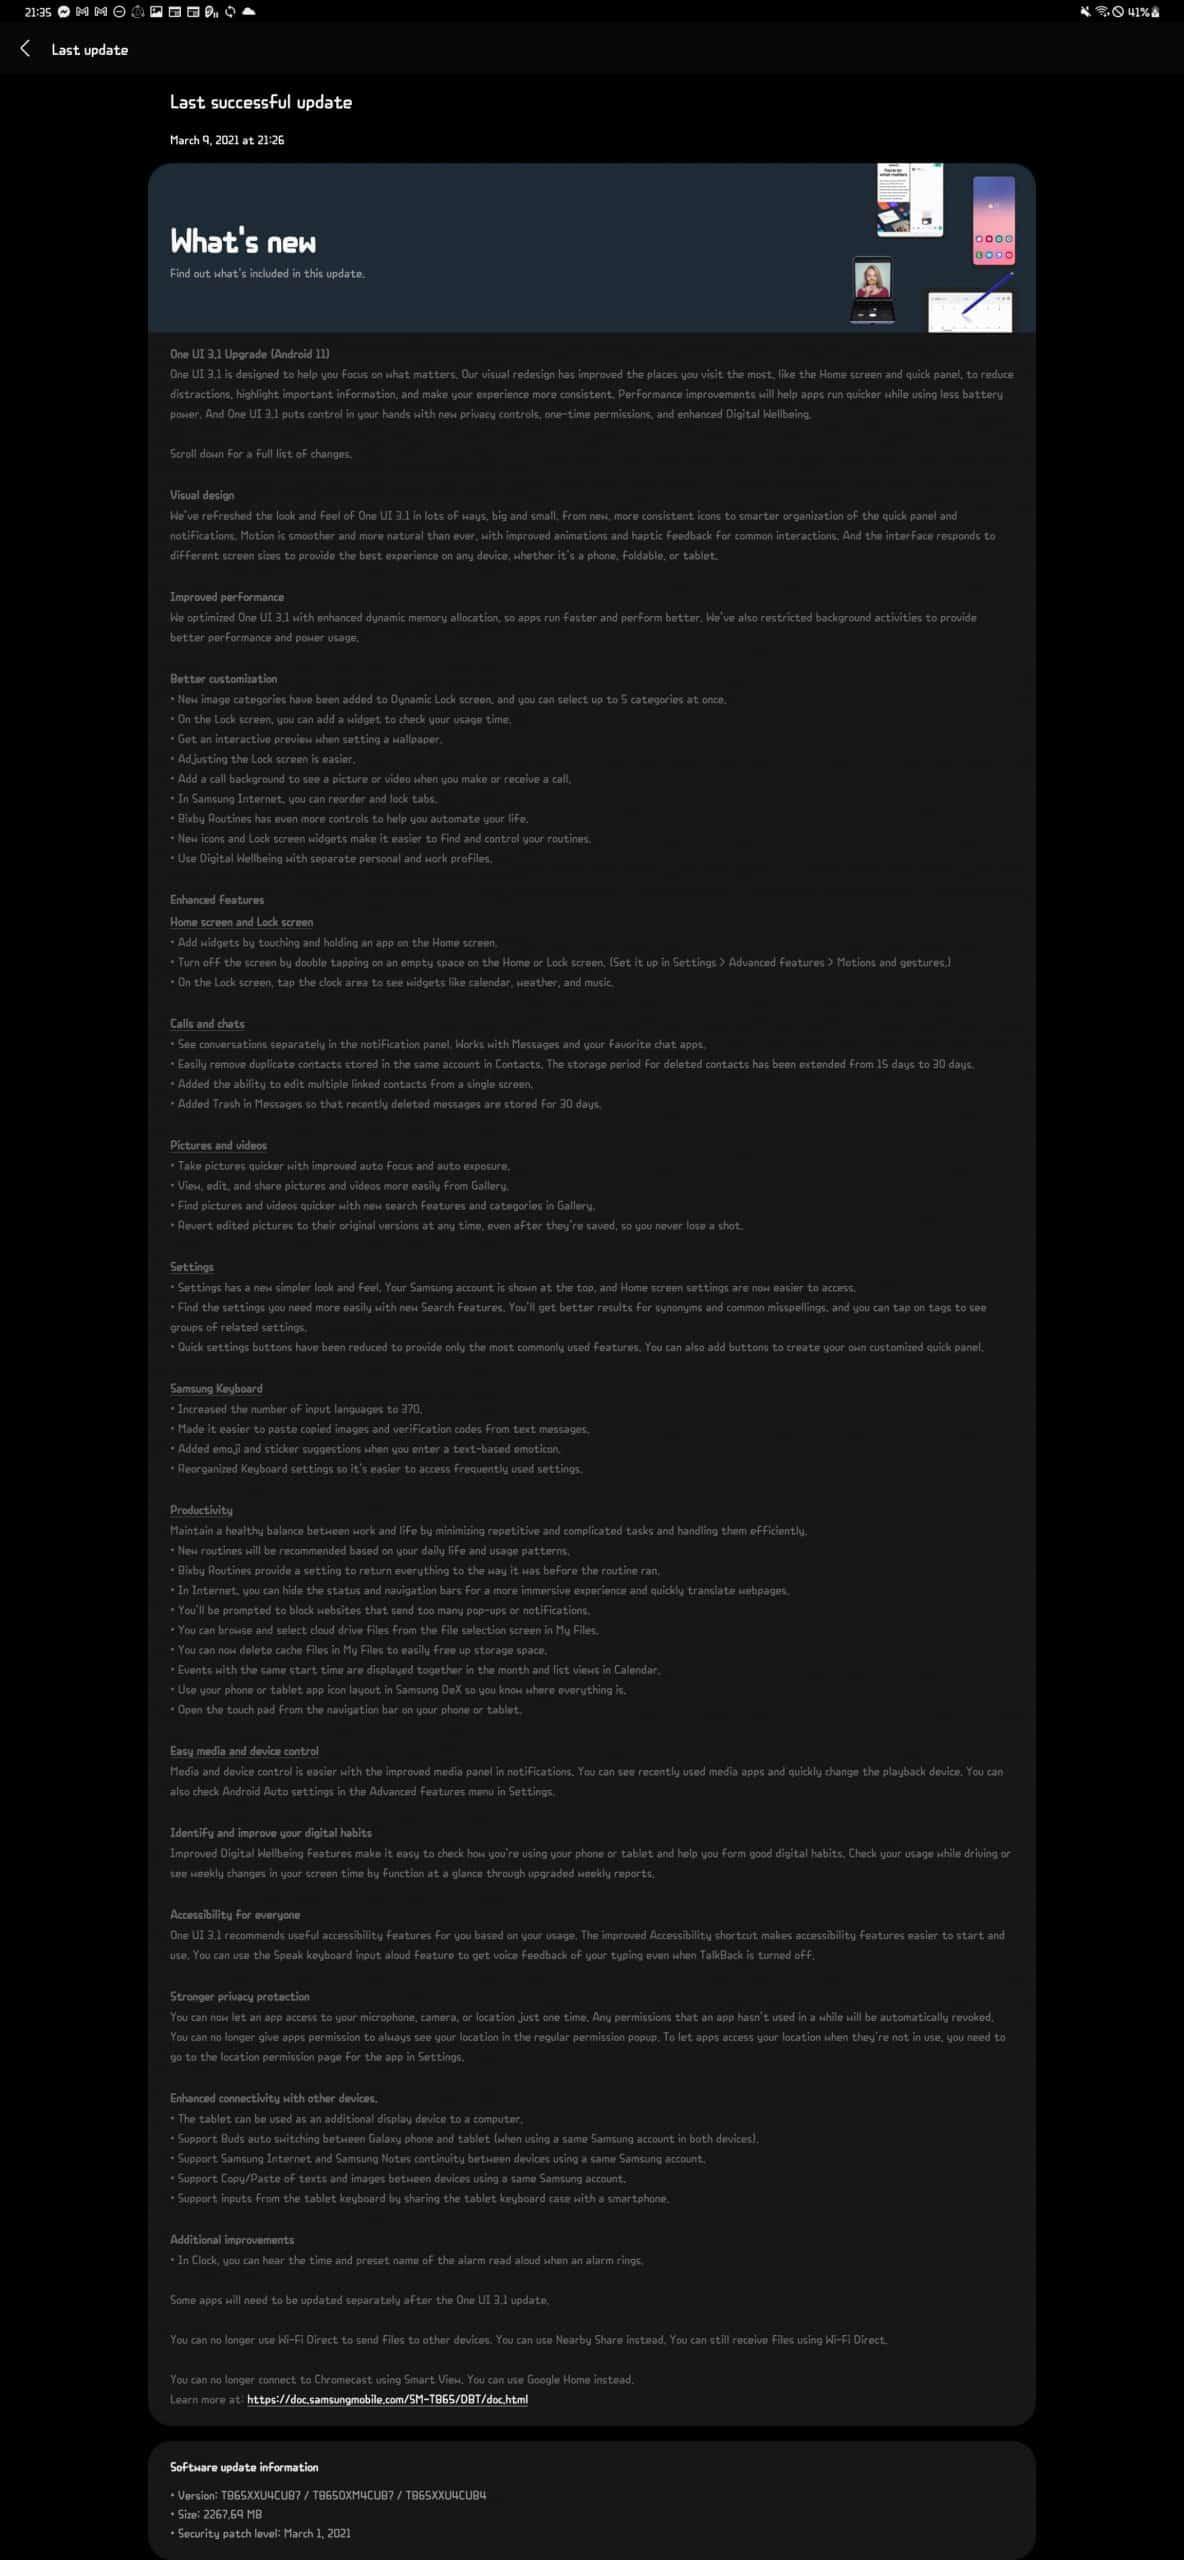 Tab S6 One UI 3.1